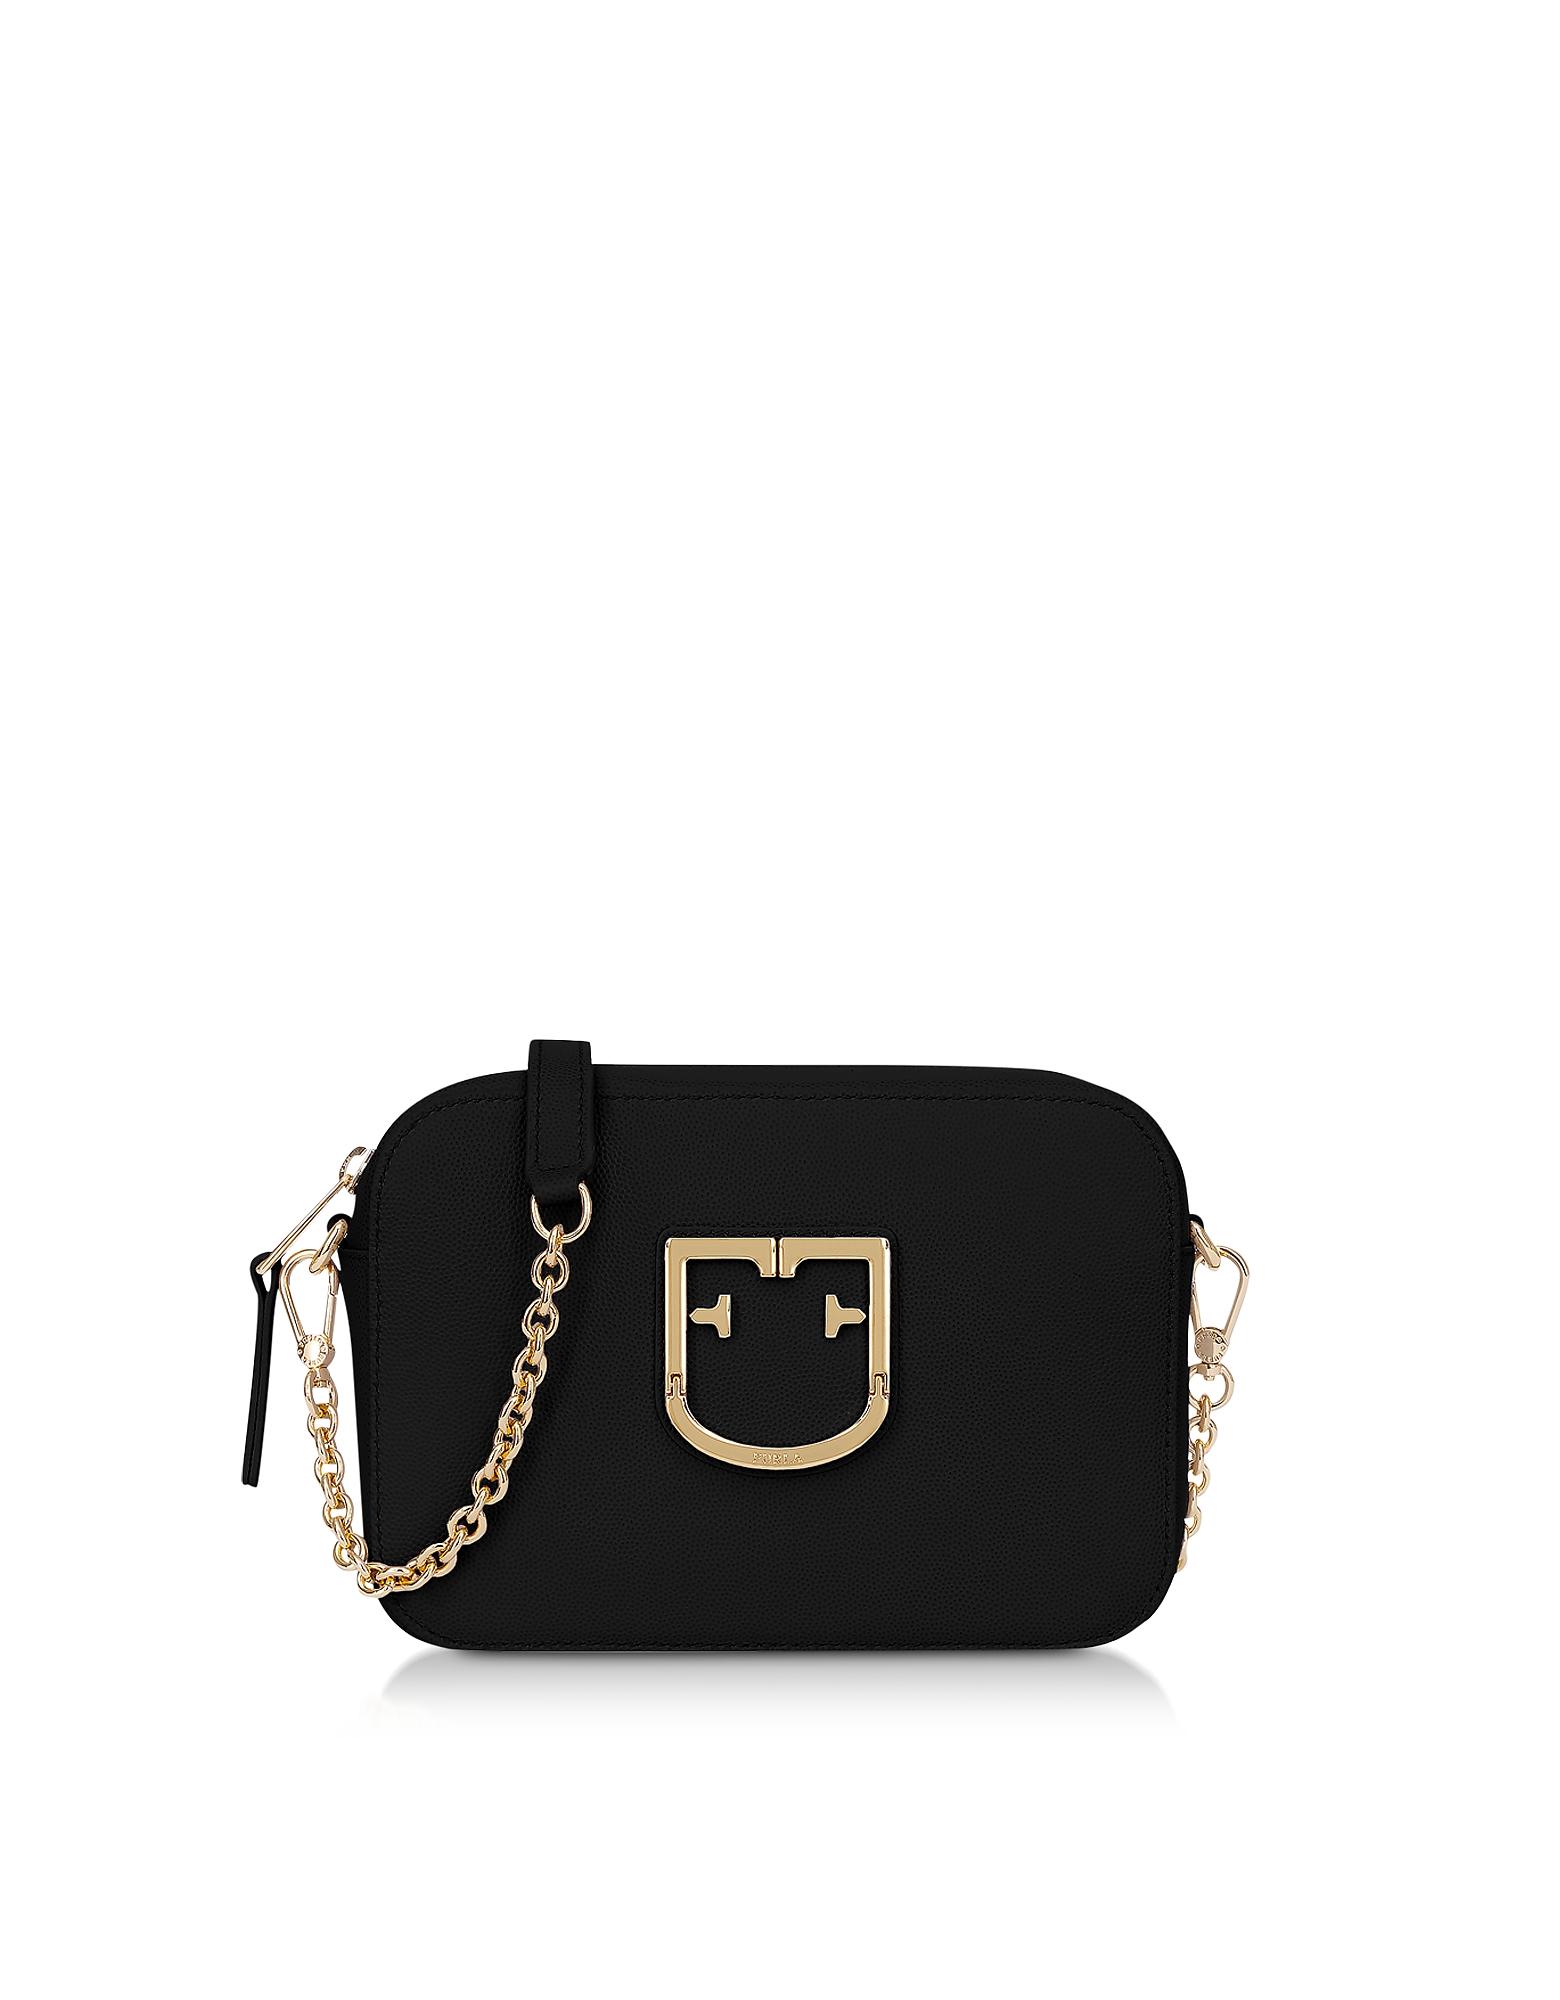 Furla Designer Handbags, Brava Mini Crossbody Bag